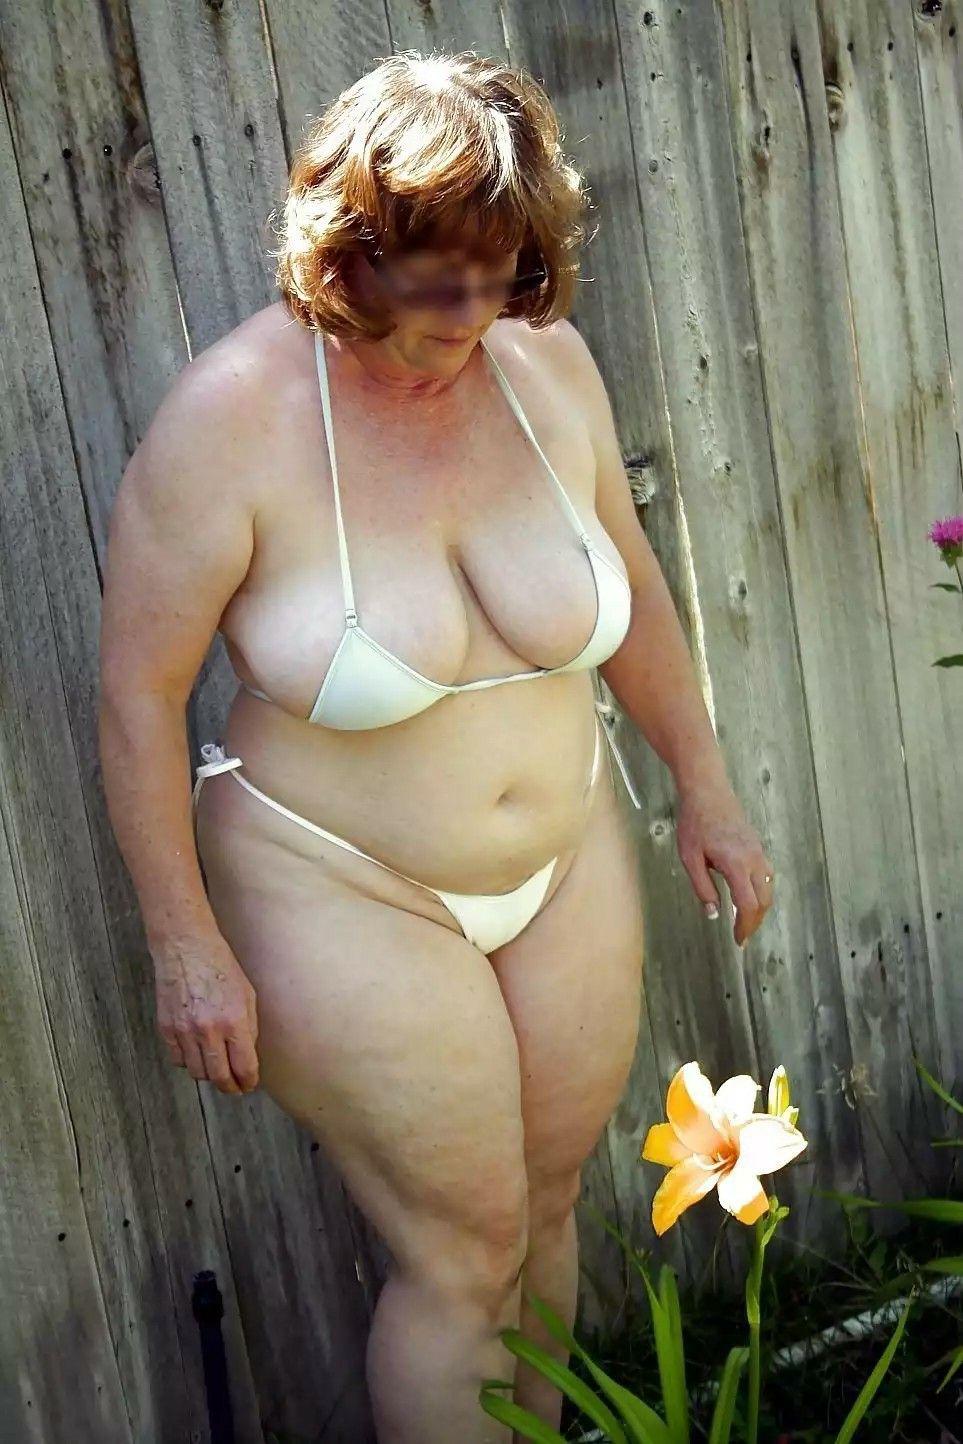 pinmax berardi on curvy woman in swimsuits | pinterest | bathing